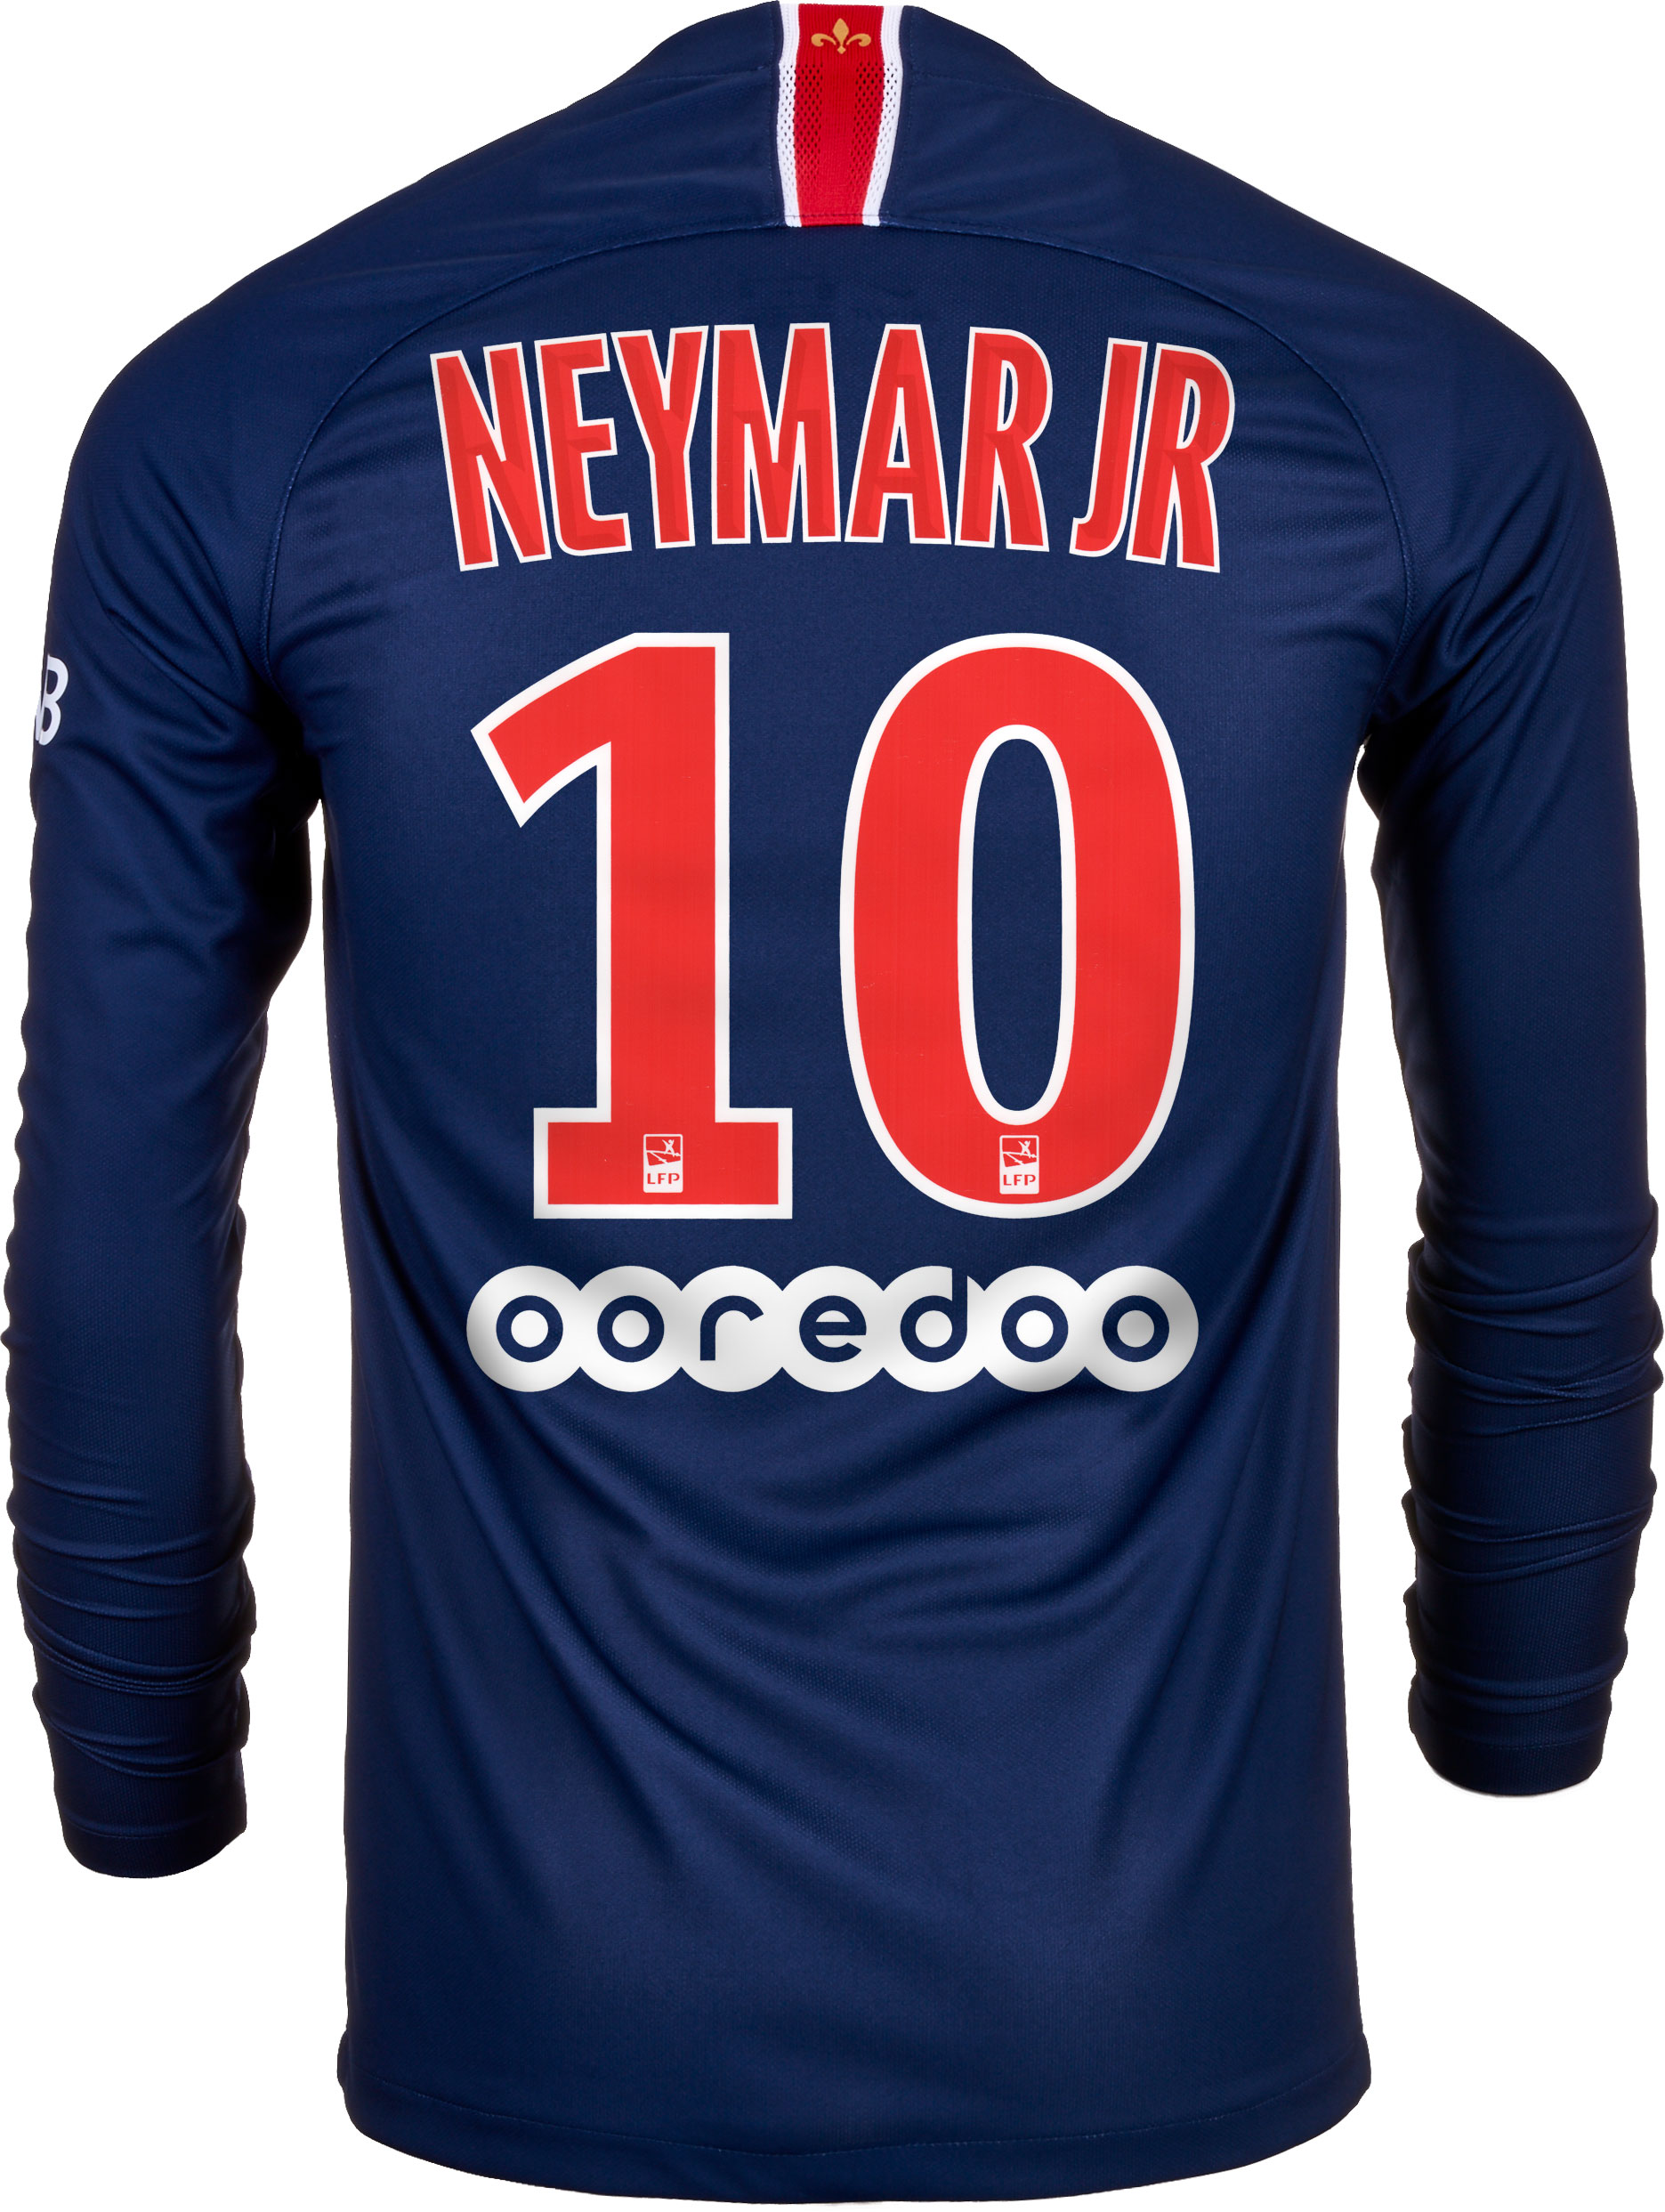 quality design 23f9f 8e1c5 Nike Neymar Jr. PSG Home L/S Jersey 2018-19 - SoccerPro